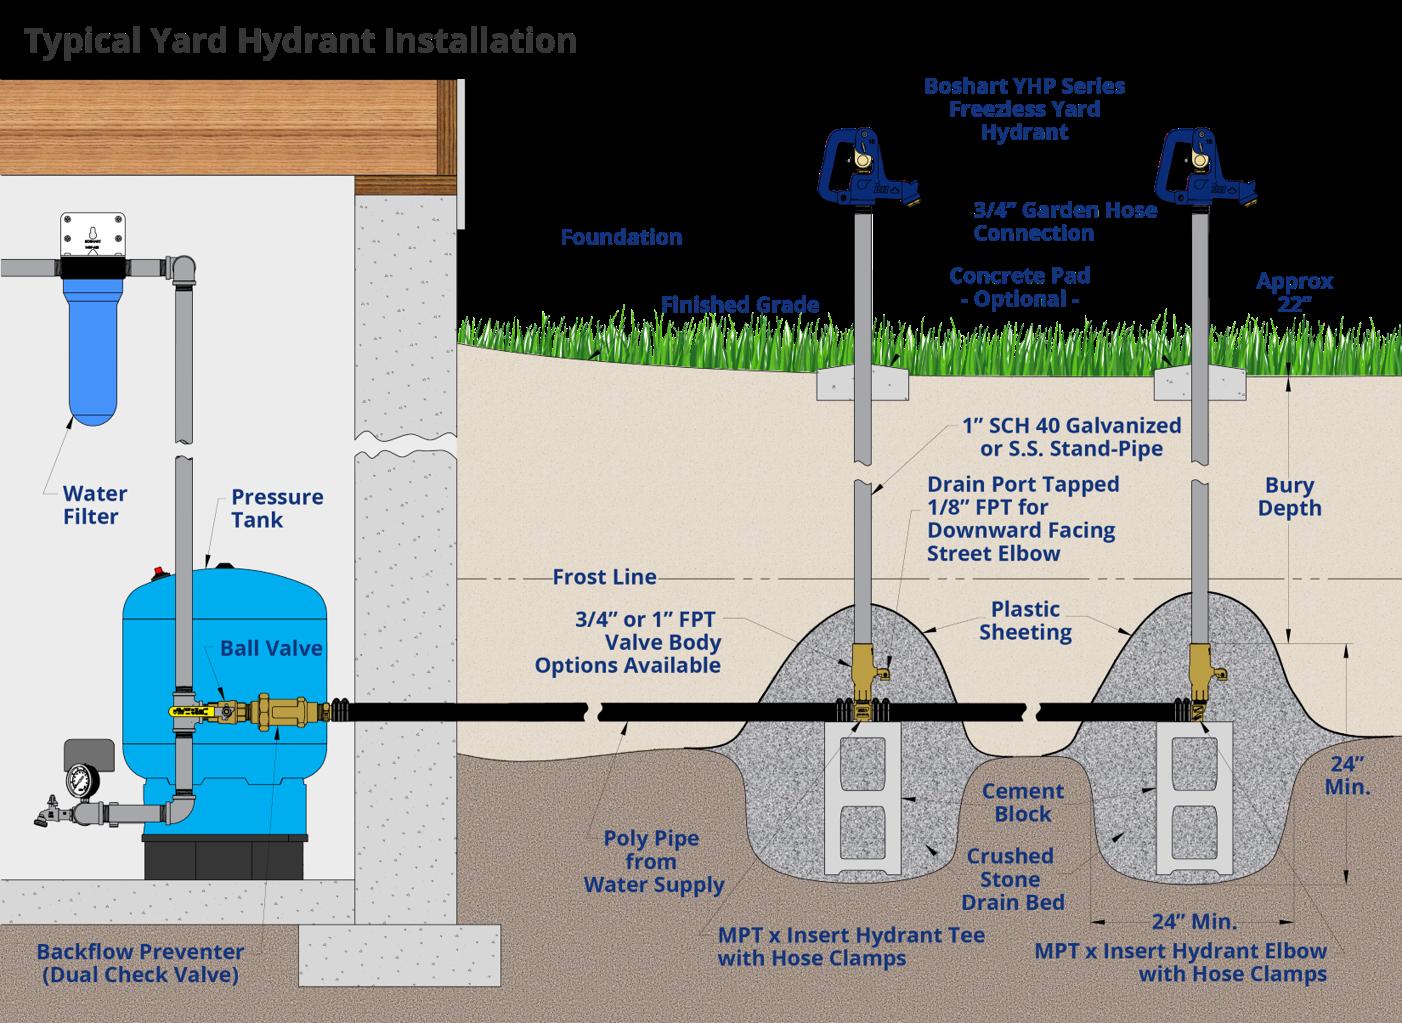 Boshart Yard Hydrant Rural Residential Install